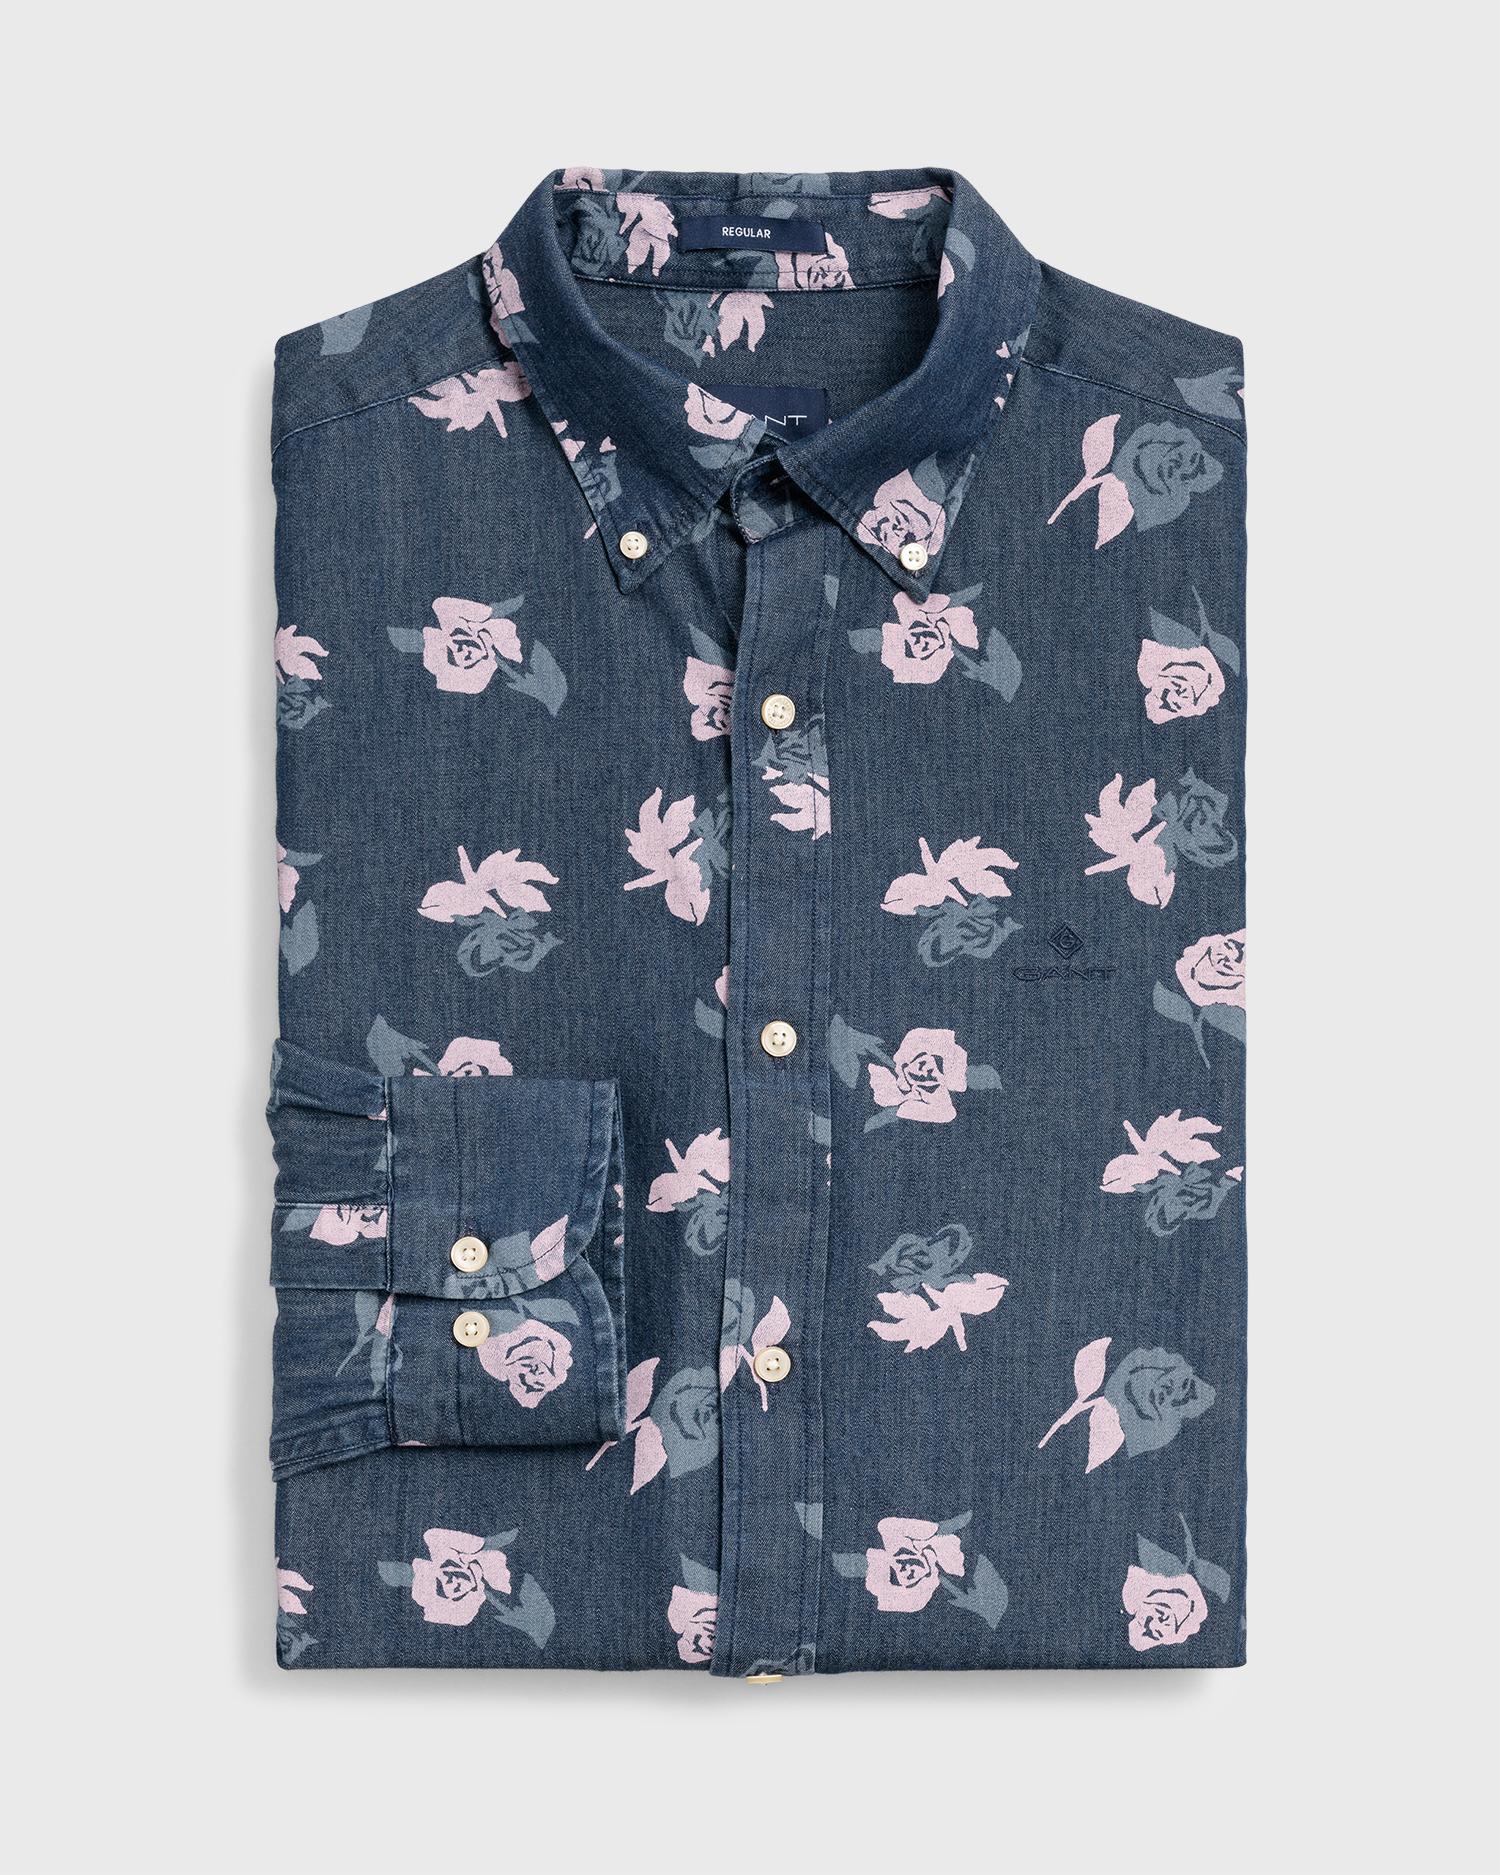 292a5c2909b GANT Regular Fit Rose Chambray Shirt in Blue for Men - Lyst